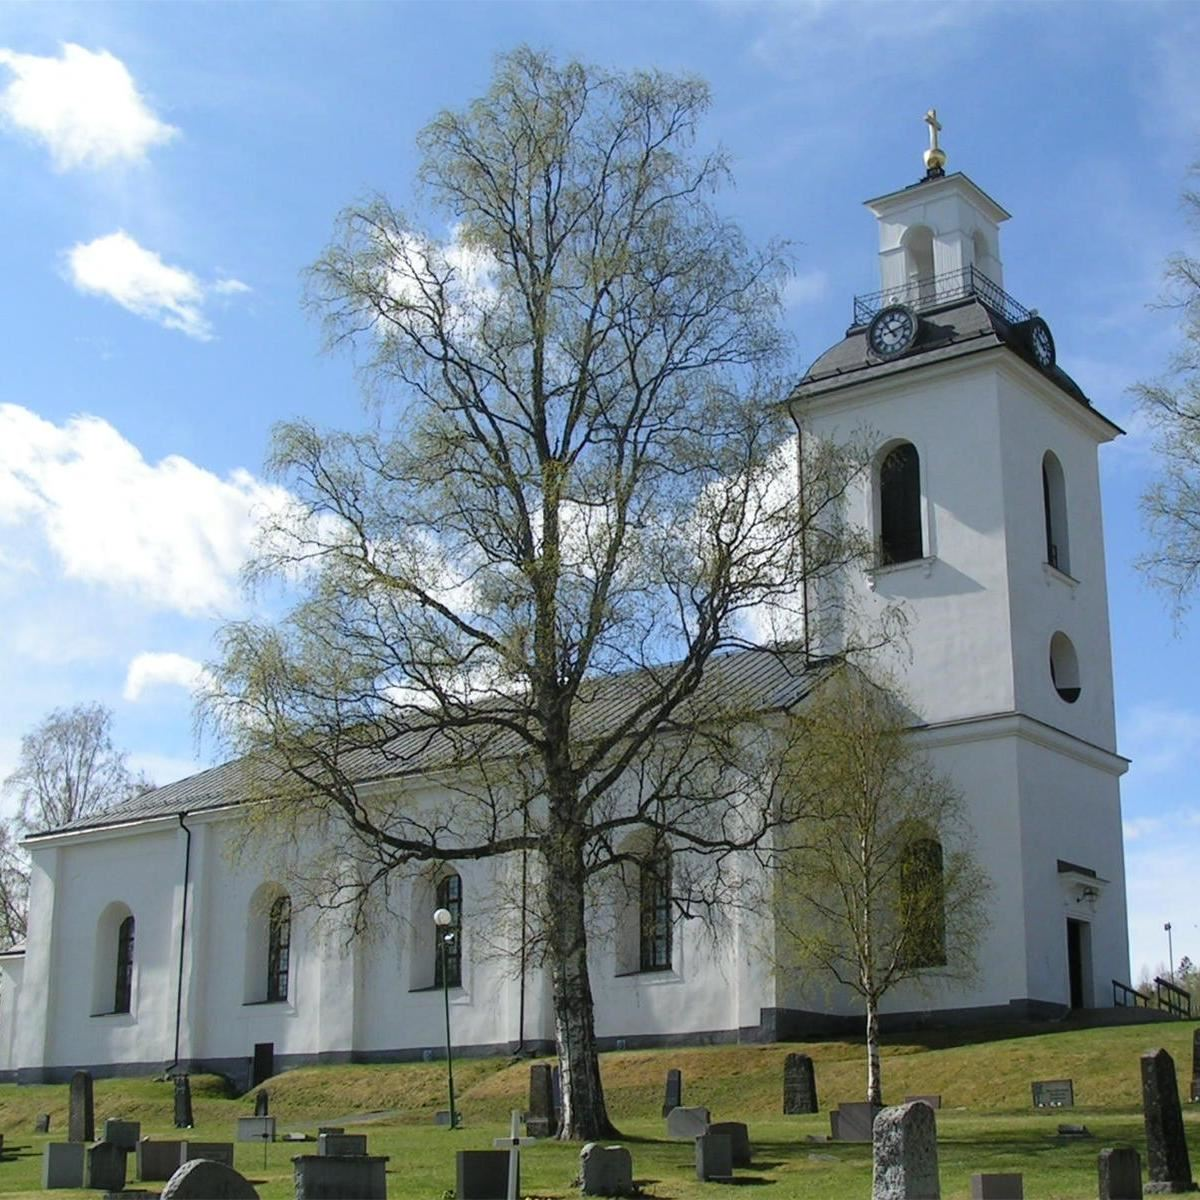 Helgums kyrka